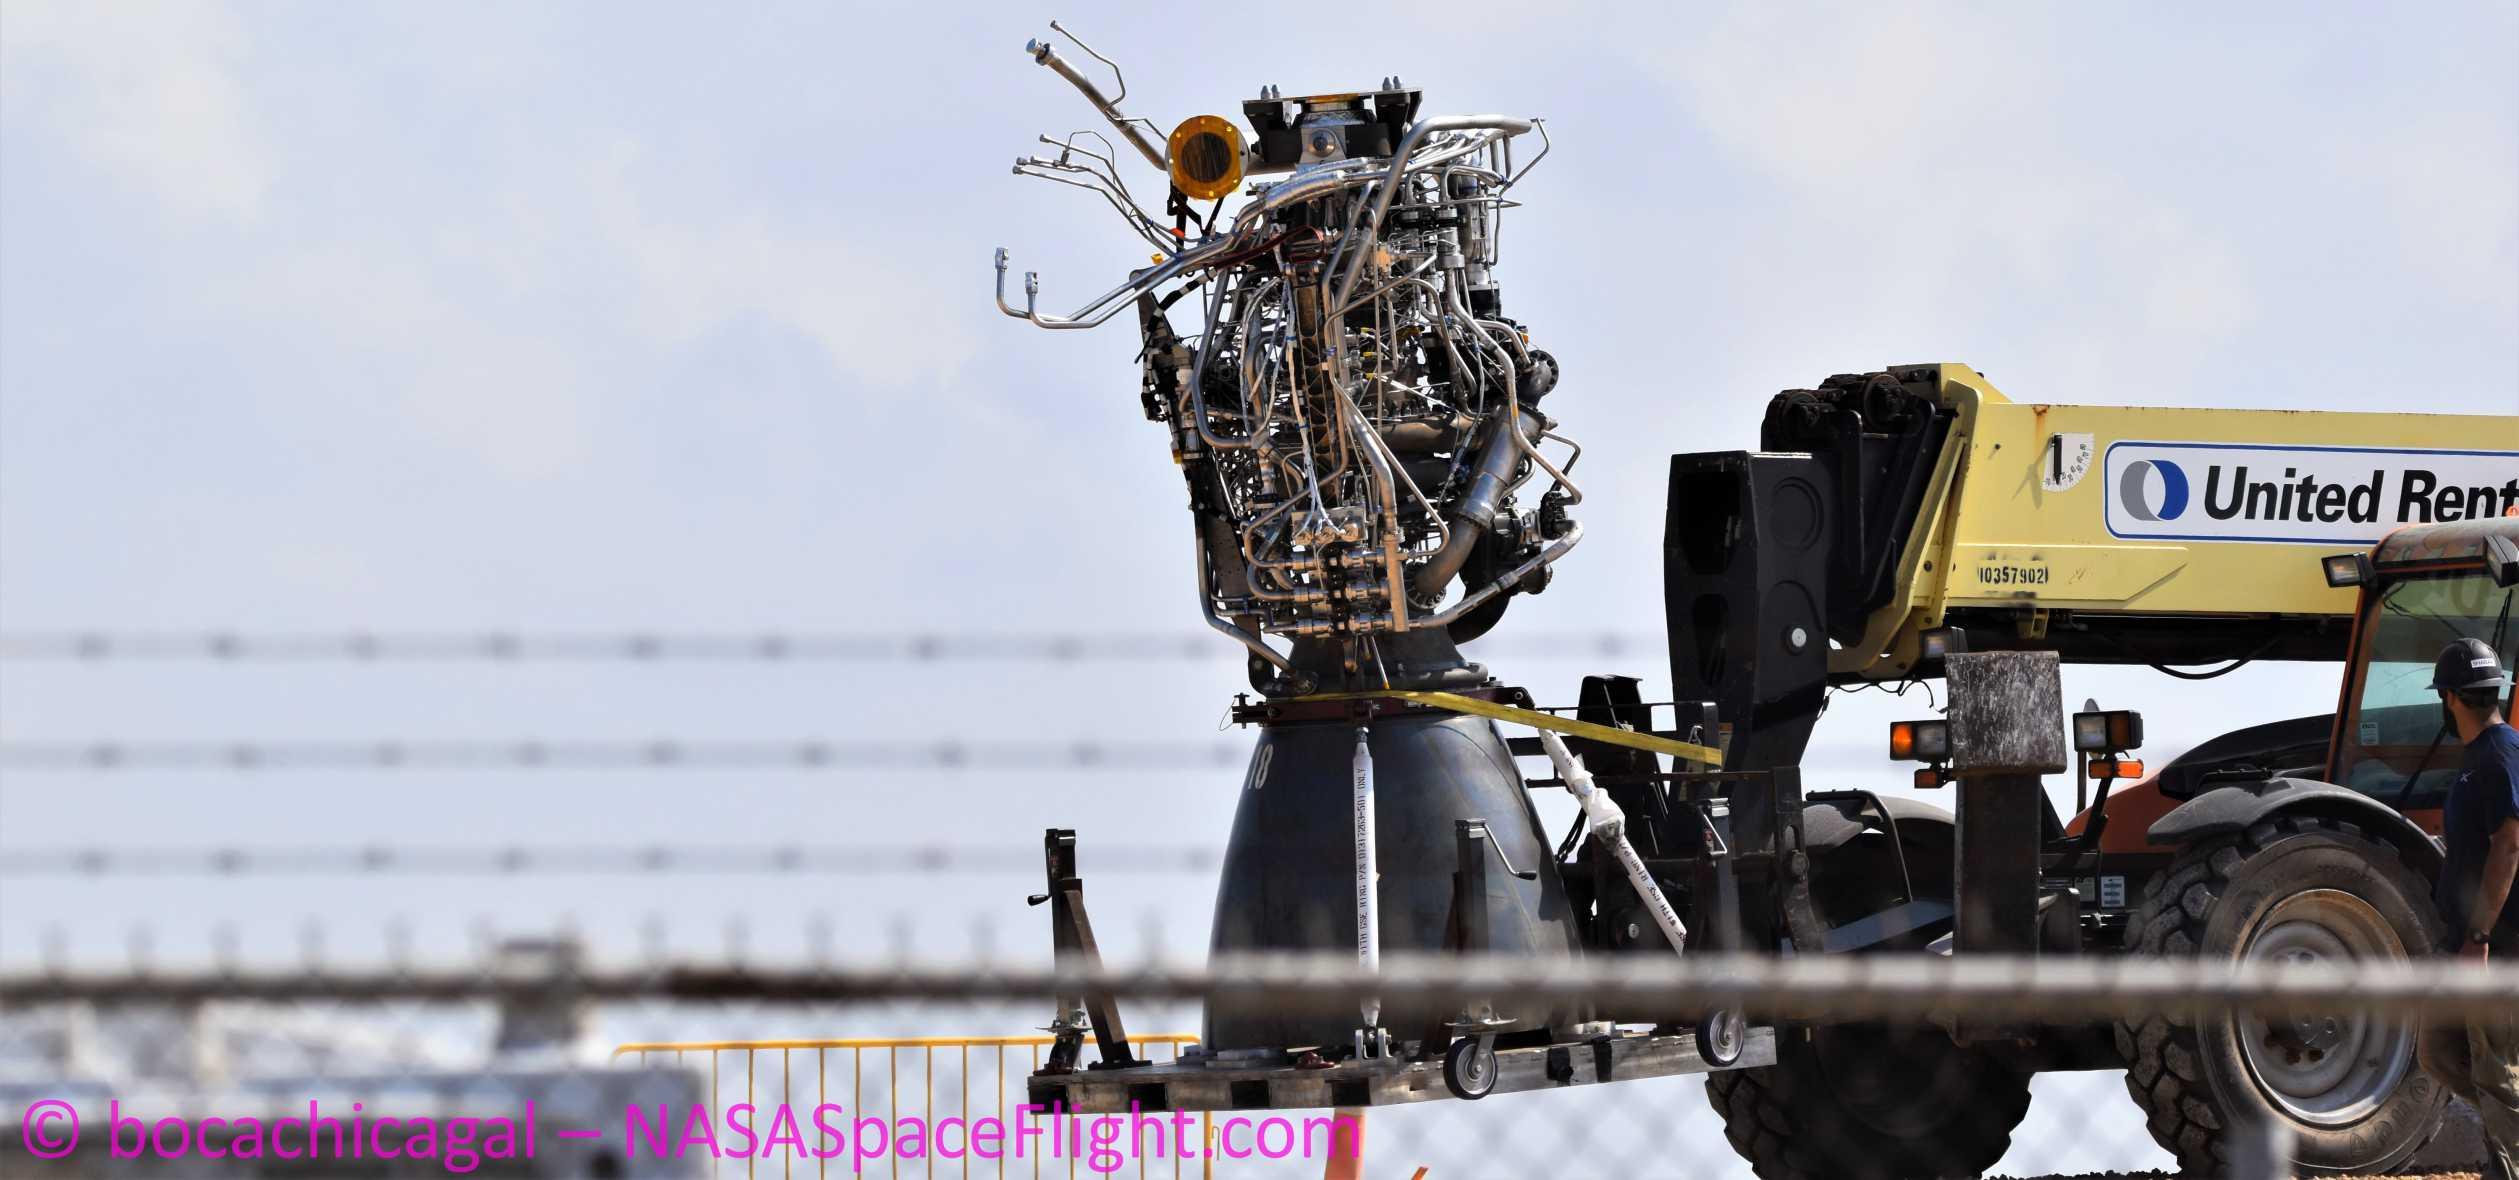 Starship Boca Chica 050720 (NASASpaceflight – bocachicagal) SN4 Raptor removal 3 crop (c)